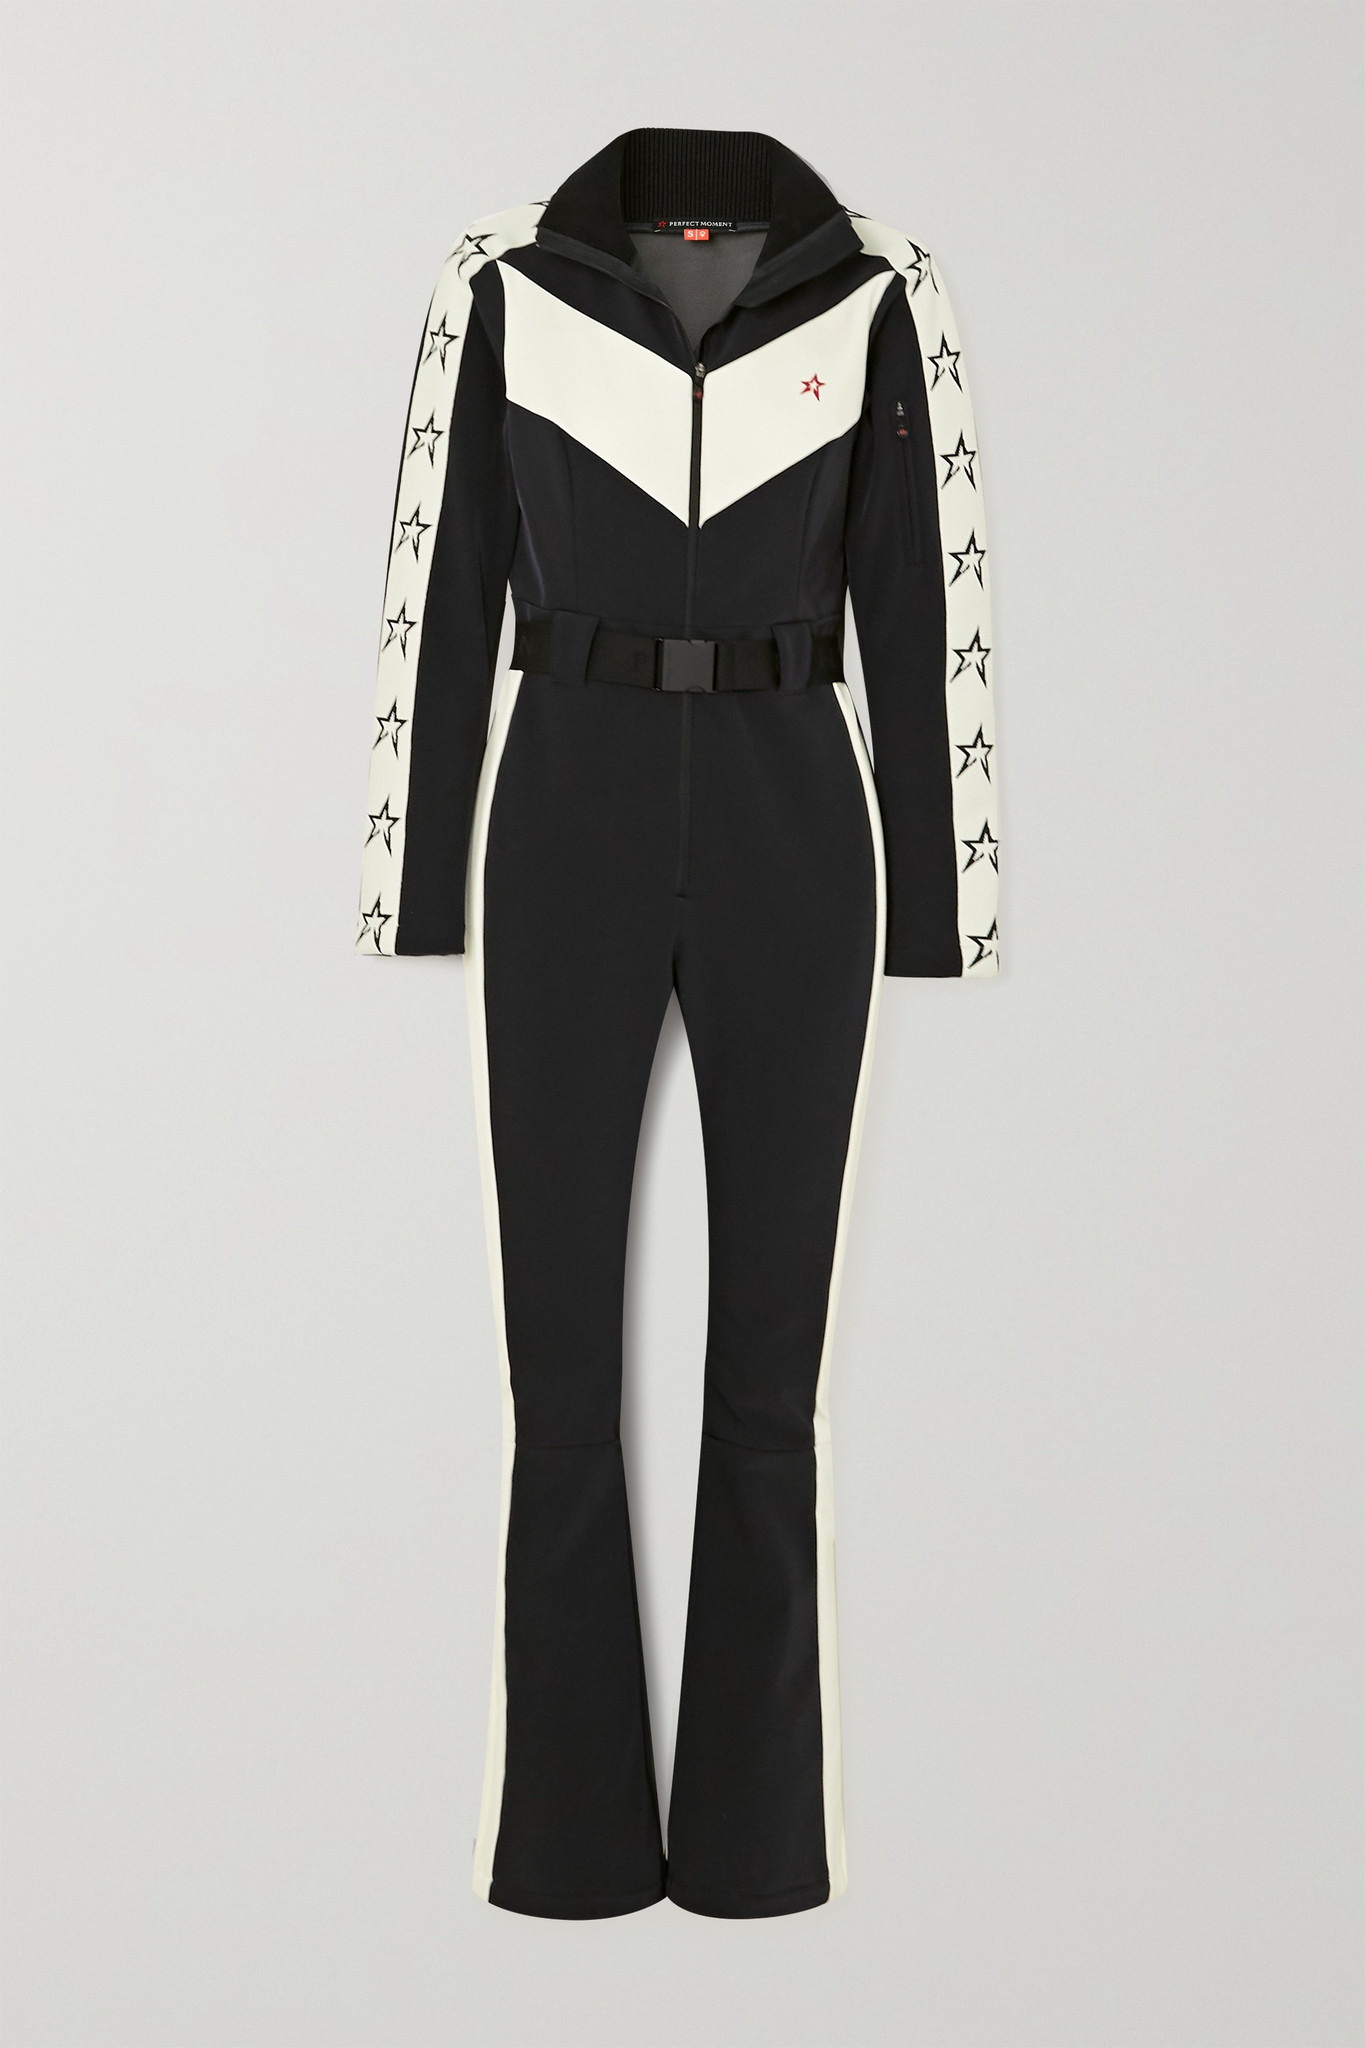 PERFECT MOMENT - Ryder 配腰带双色滑雪服 - 黑色 - large